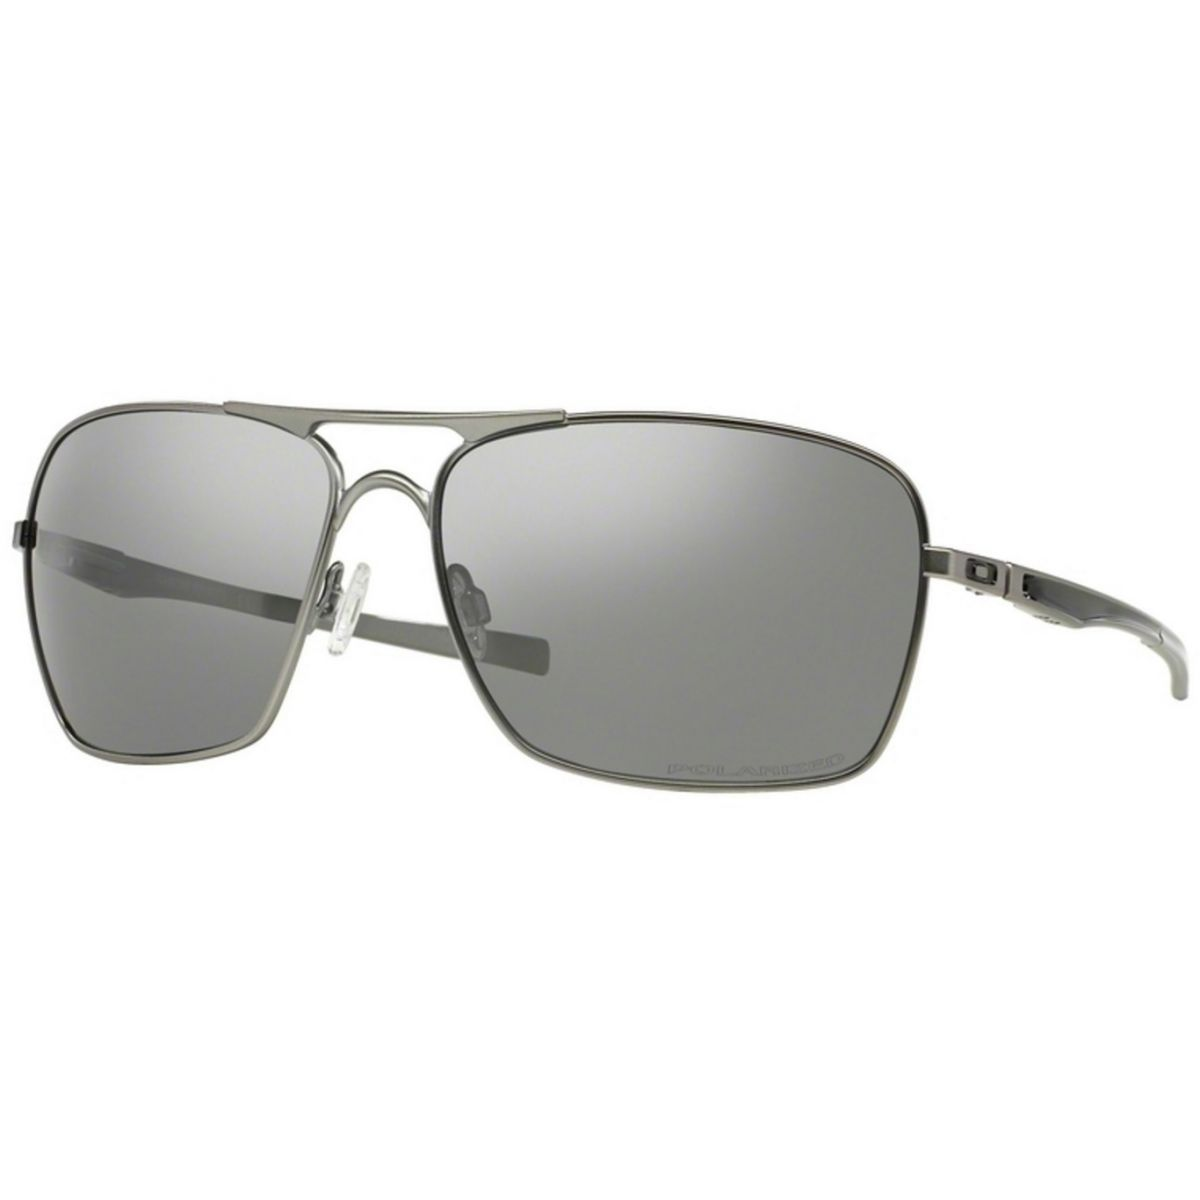 cc5597c76d05a Óculos De Sol Oakley Plaintiff Squared Polarizado OO4063 09Oakley ...